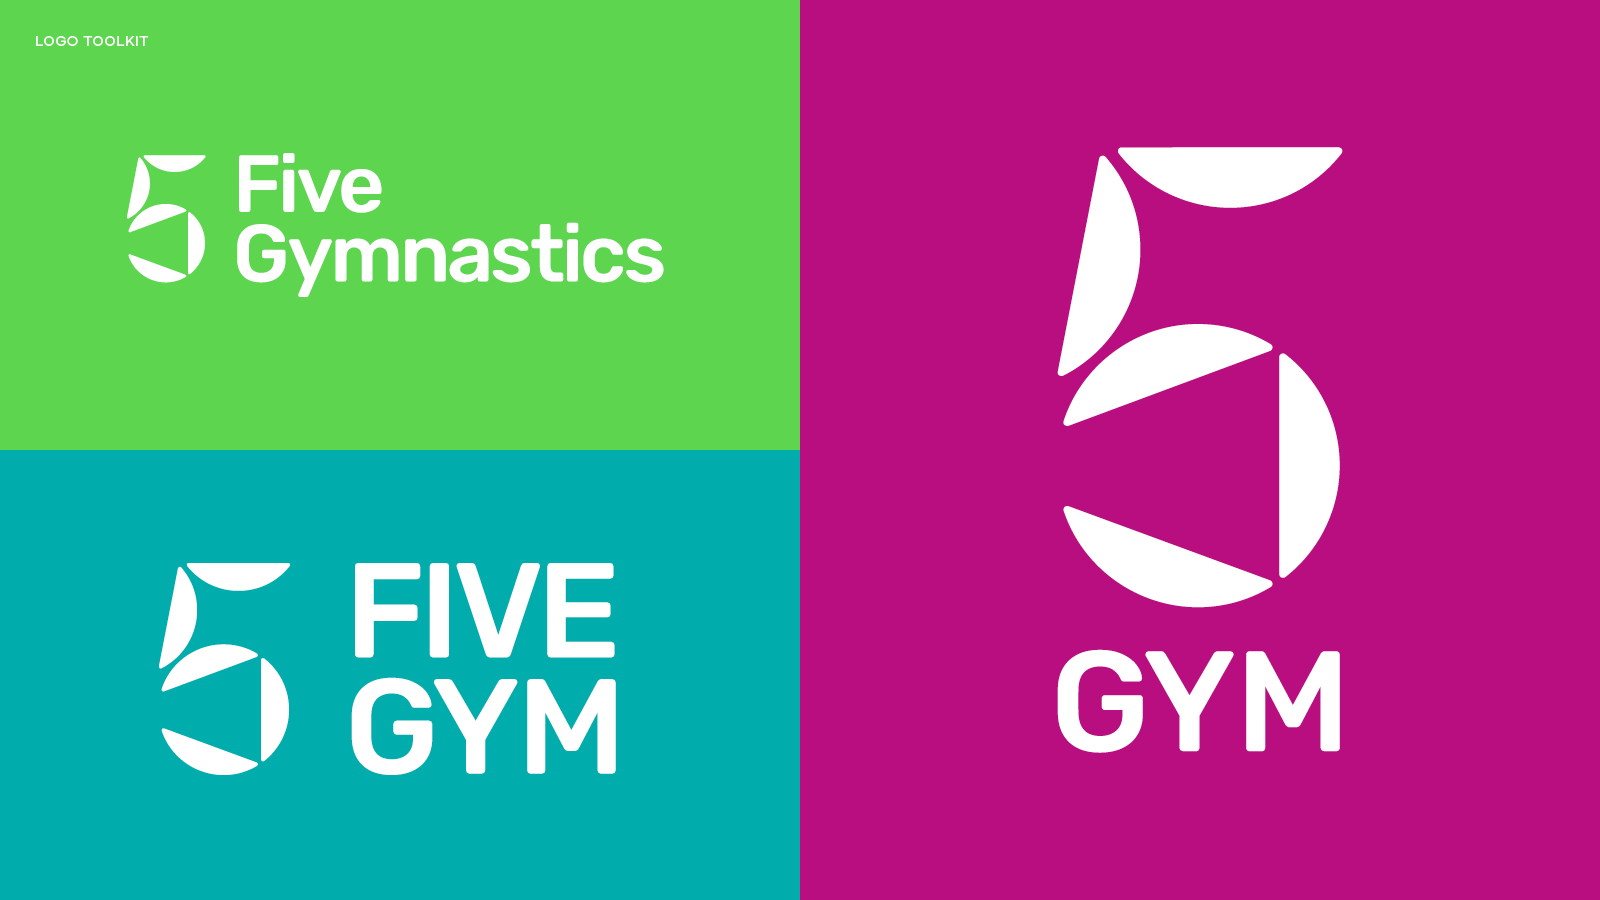 identity-design-logo-gym-gymnastics-british-five-typography-branding-milton-keynes-19